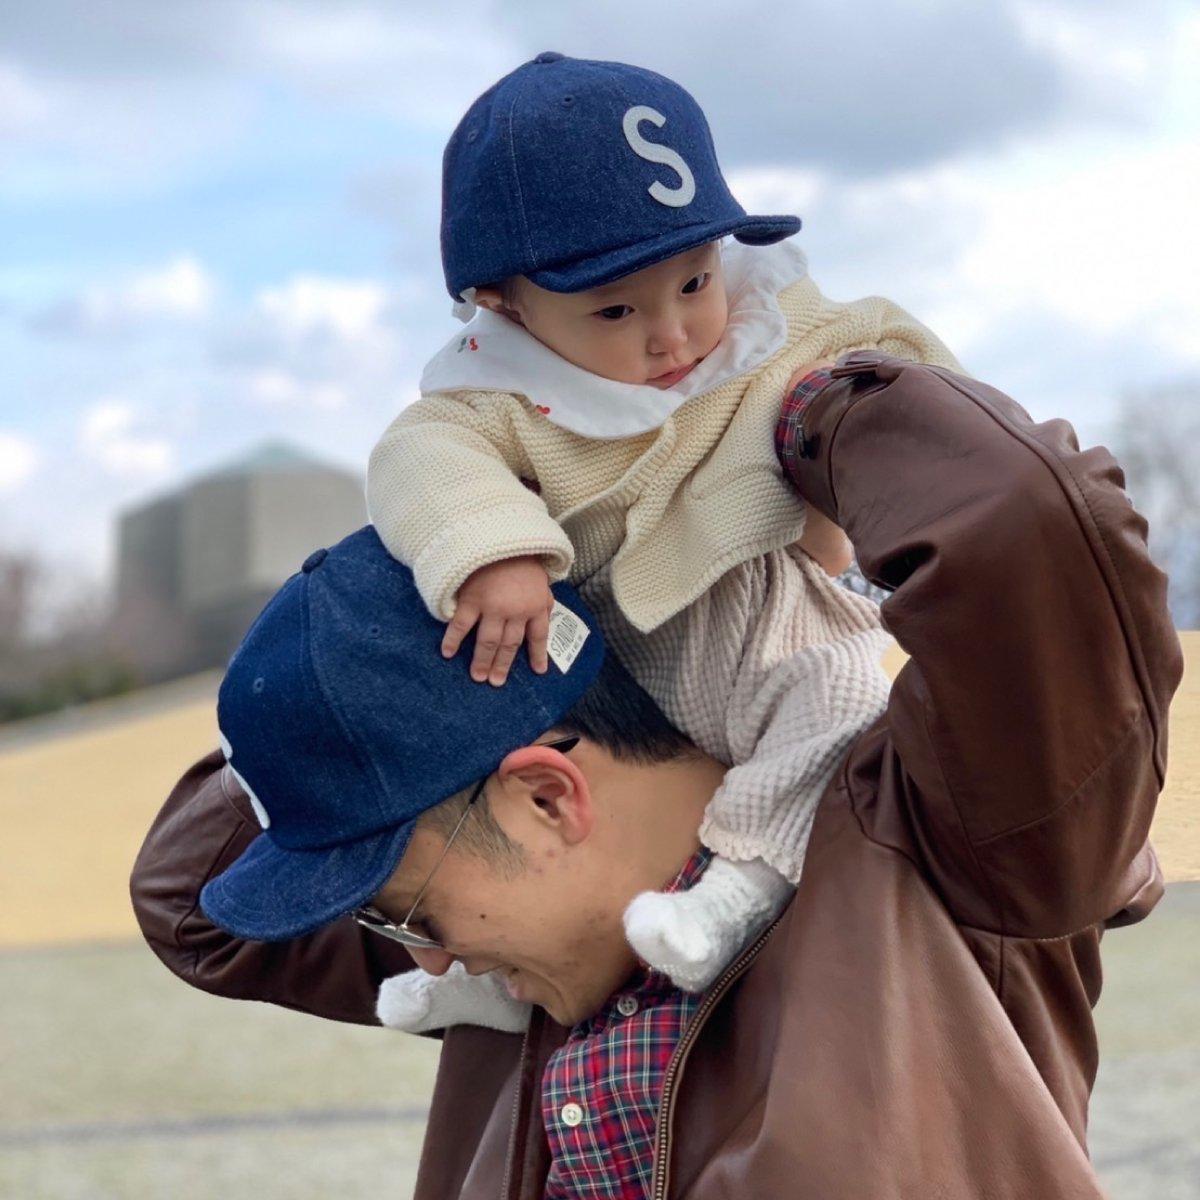 【BABY】Baby Sim Logo Cap 詳細画像29